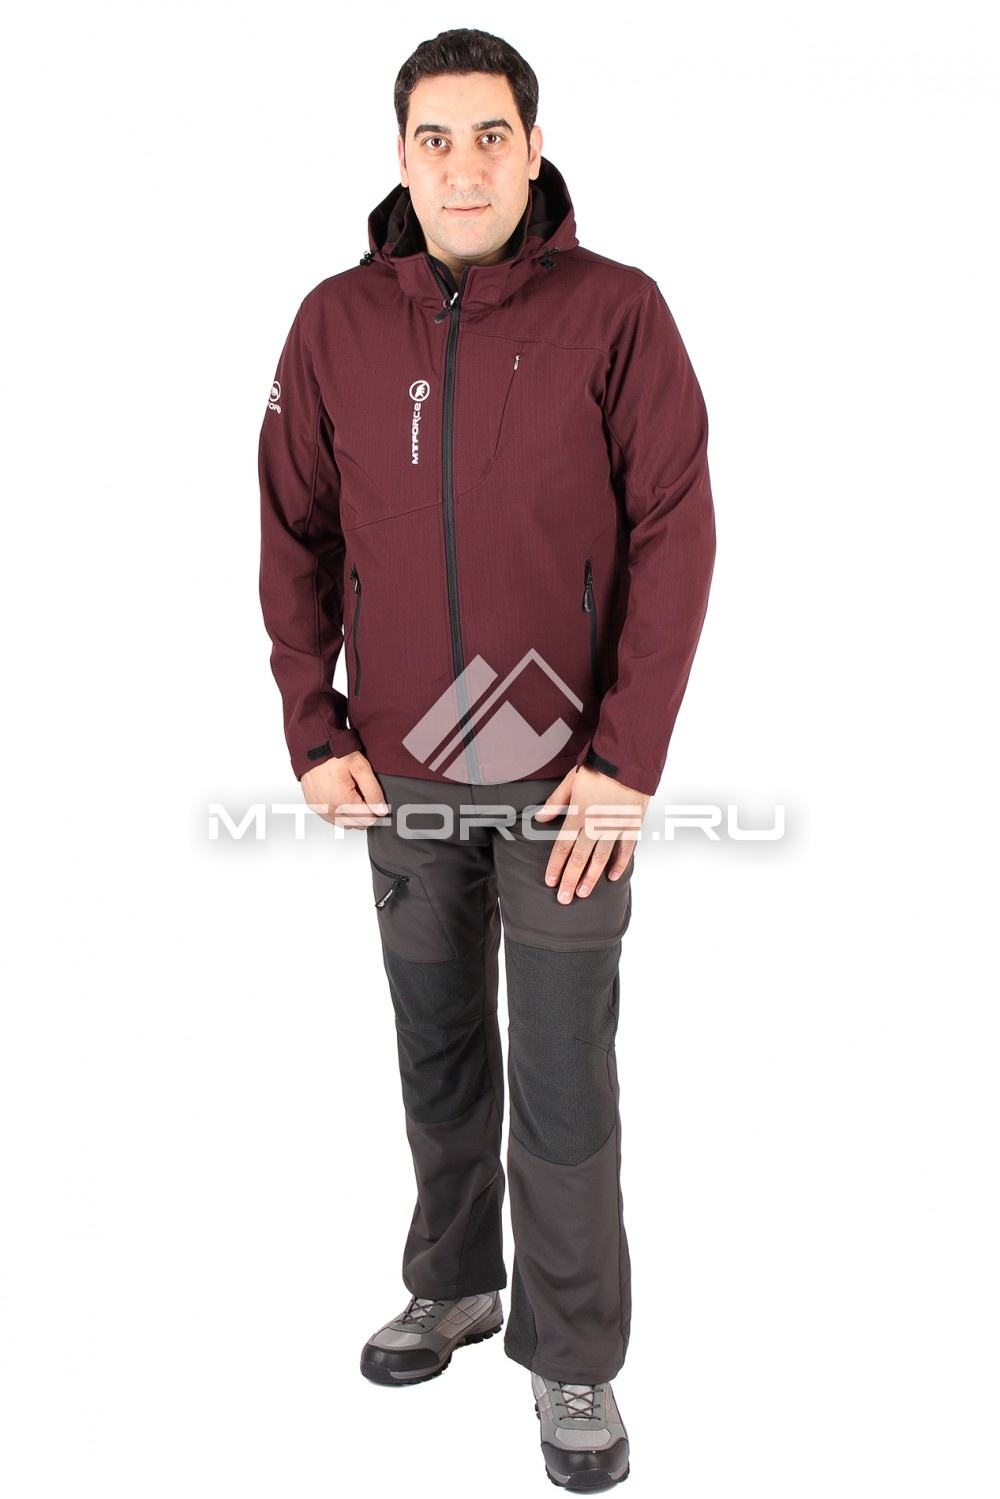 Купить                                  оптом Костюм виндстопер мужской бордового цвета 1504Bo